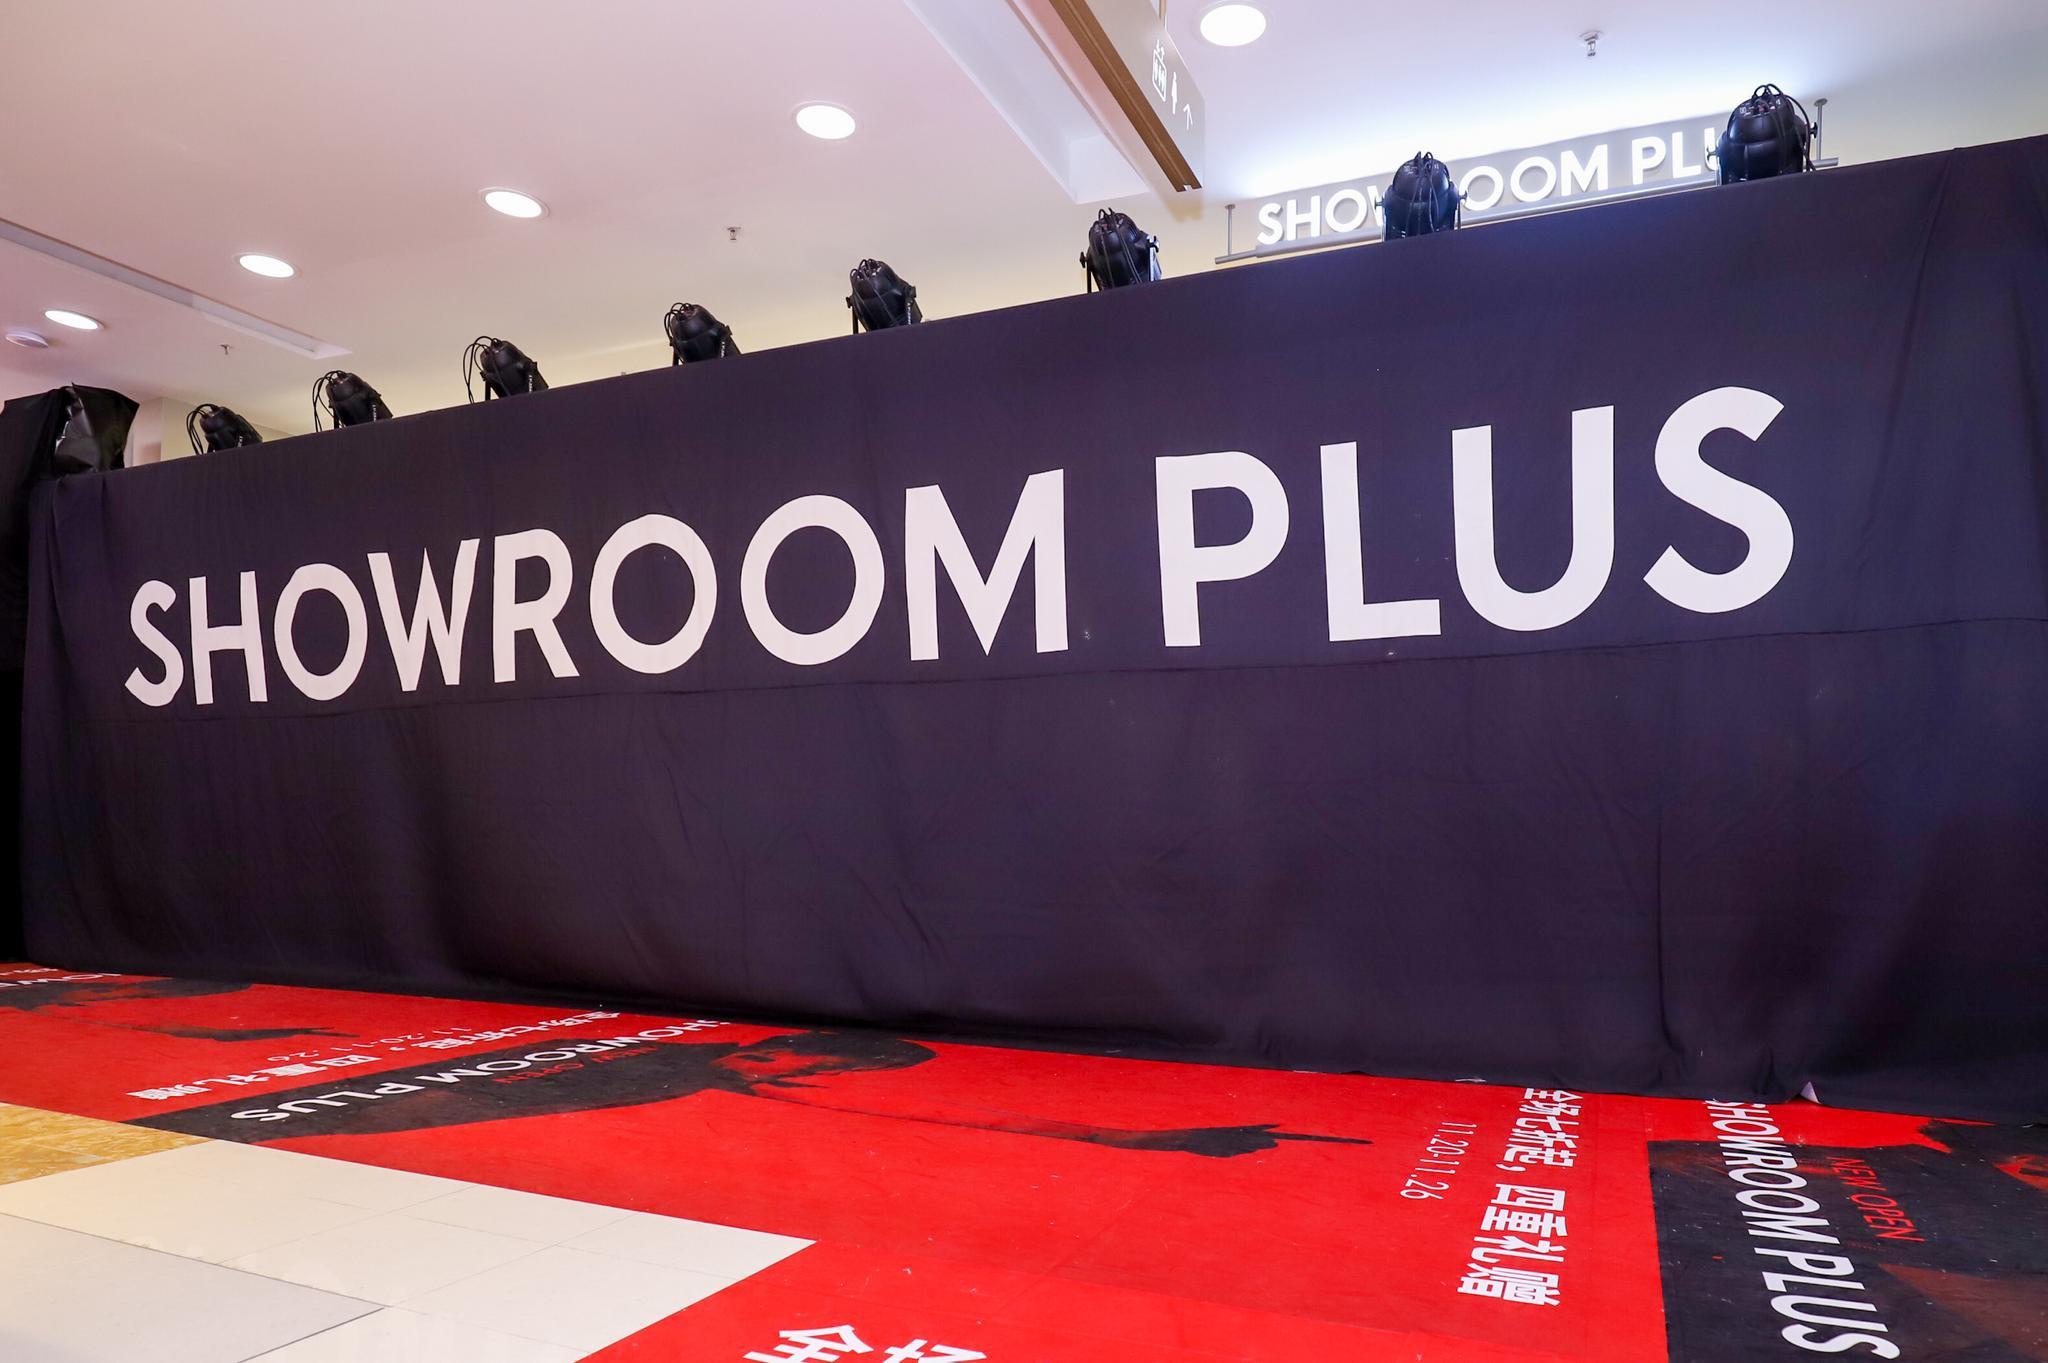 SHOWROOM PLUS崛起先锋力量 品牌国内首家线下体验店盛大开幕